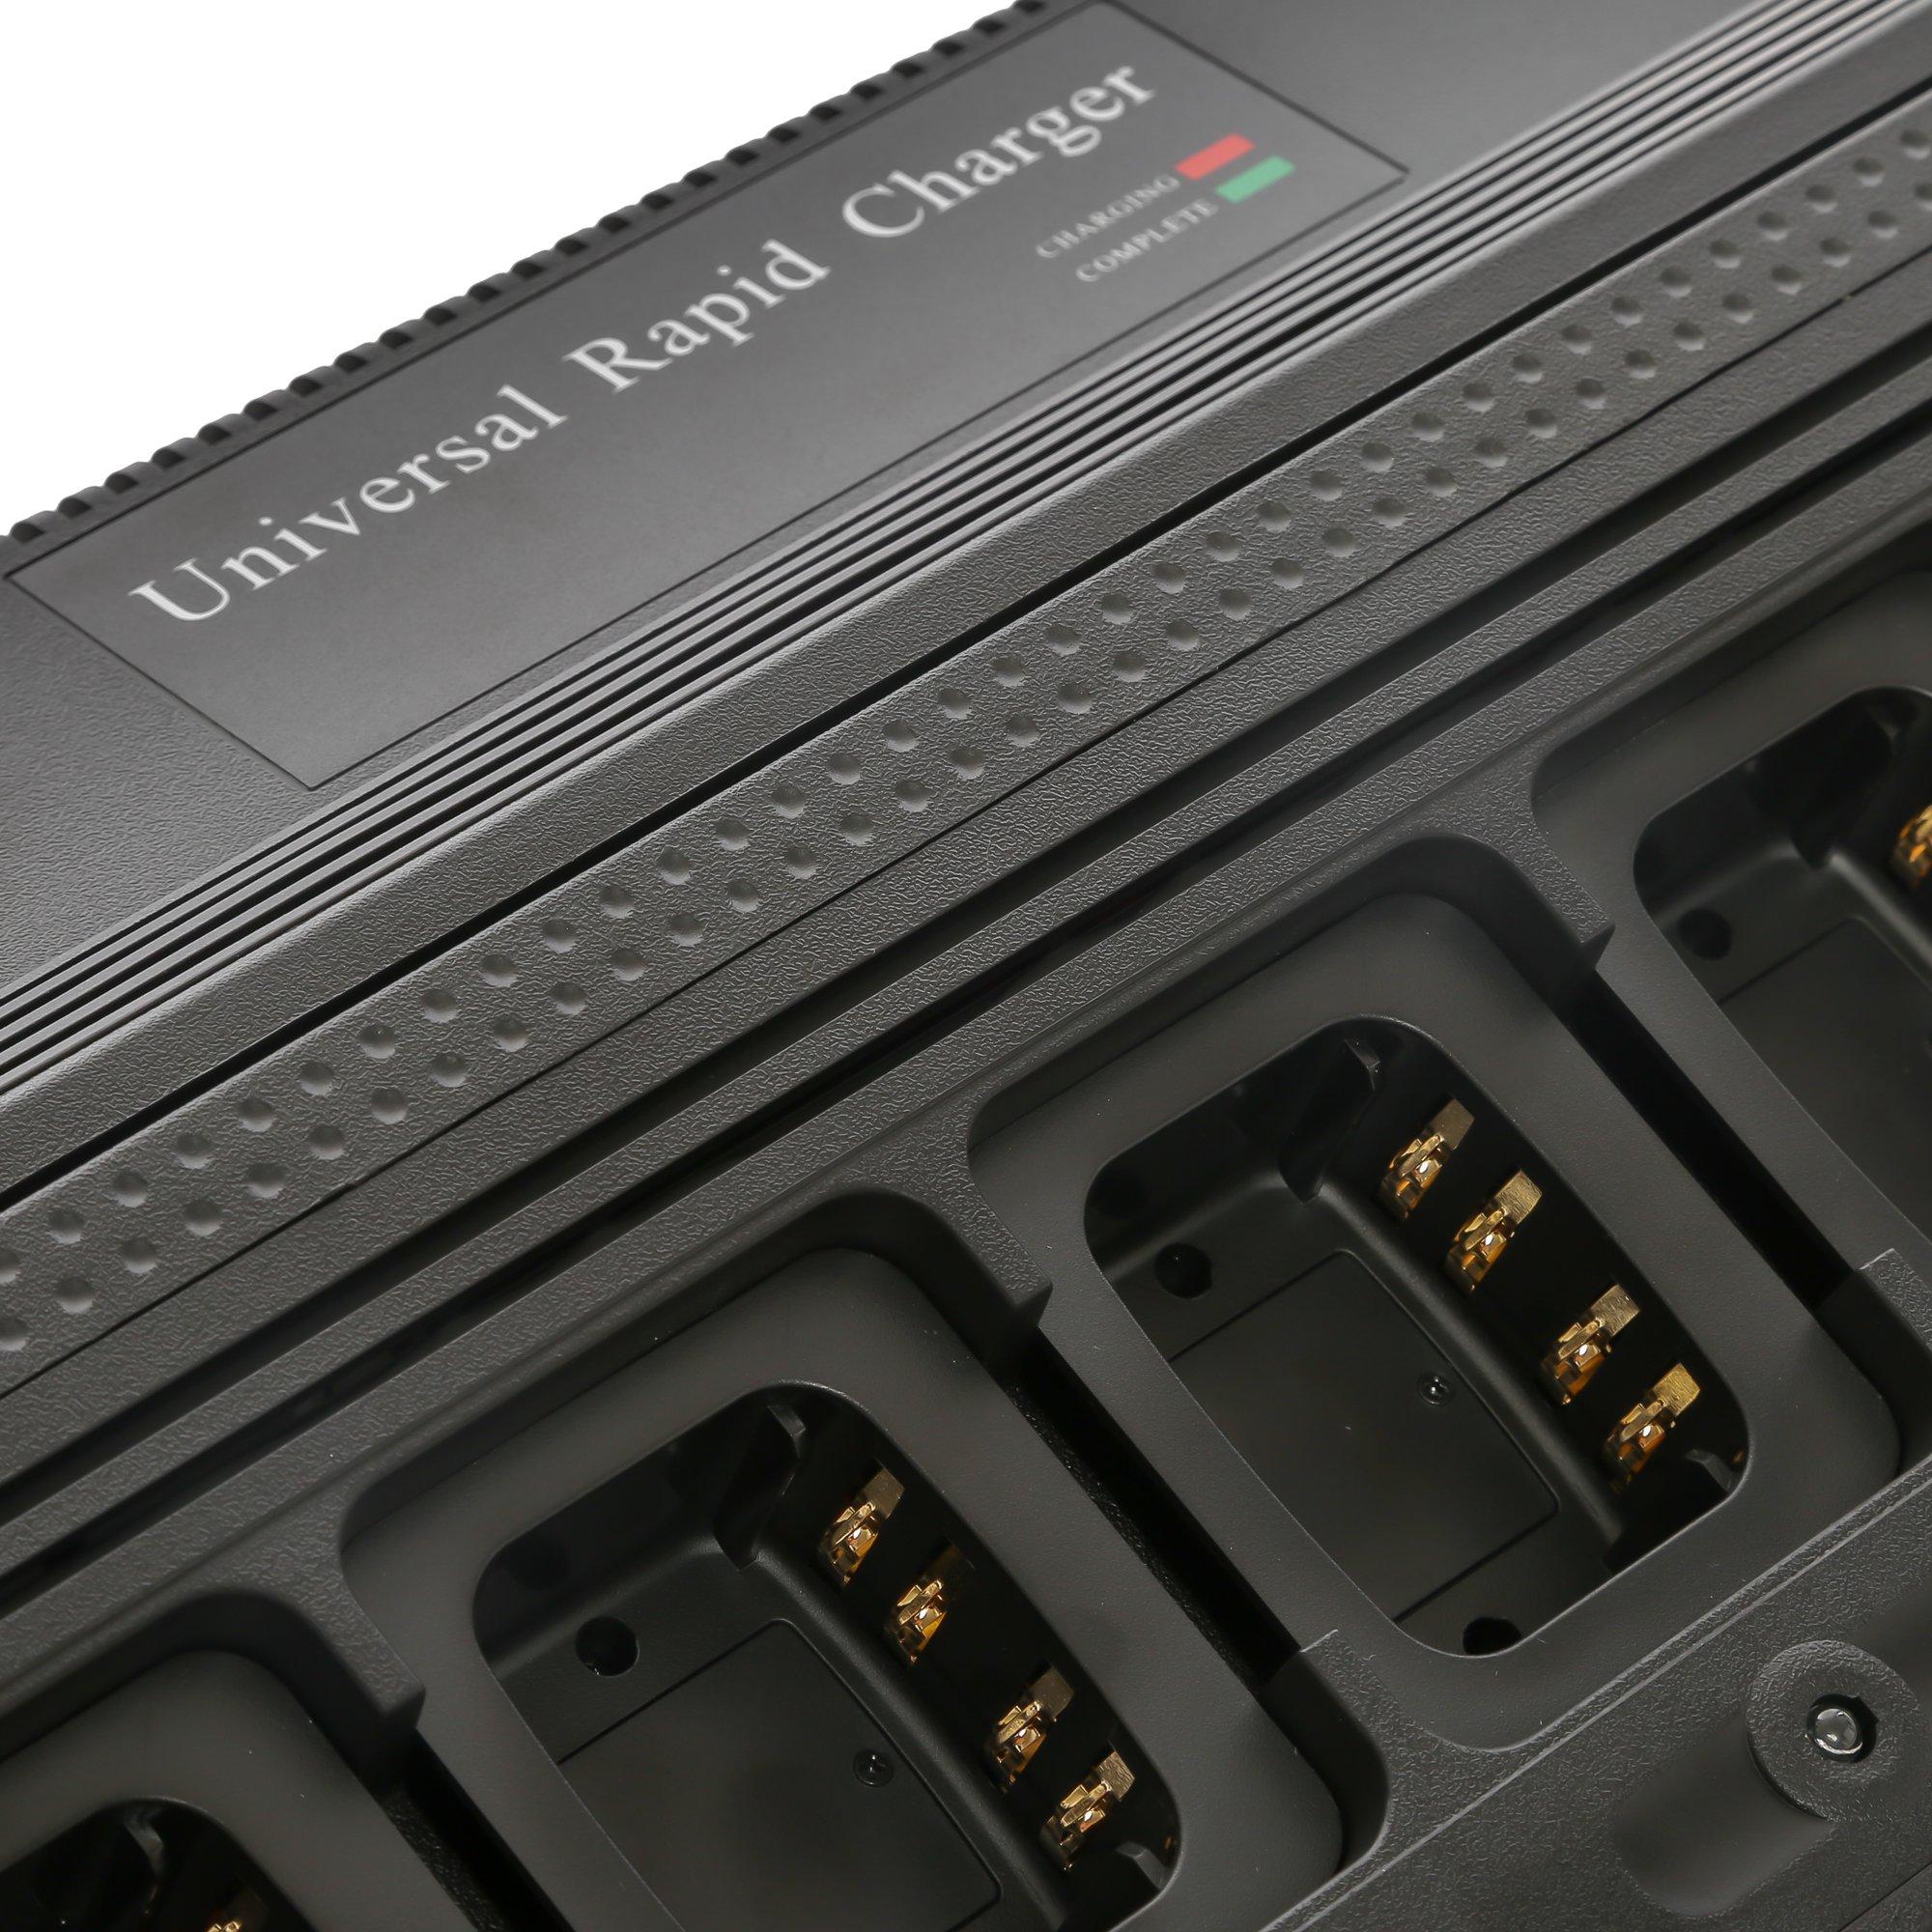 Maxtop AM6R4232-120-V3 Six Unit Bank Rapid Charger for Motorola DR3000 DP3400 DP3401 DP3600 DP3601 DGP4150 DGP4150+ by MAXTOP (Image #4)